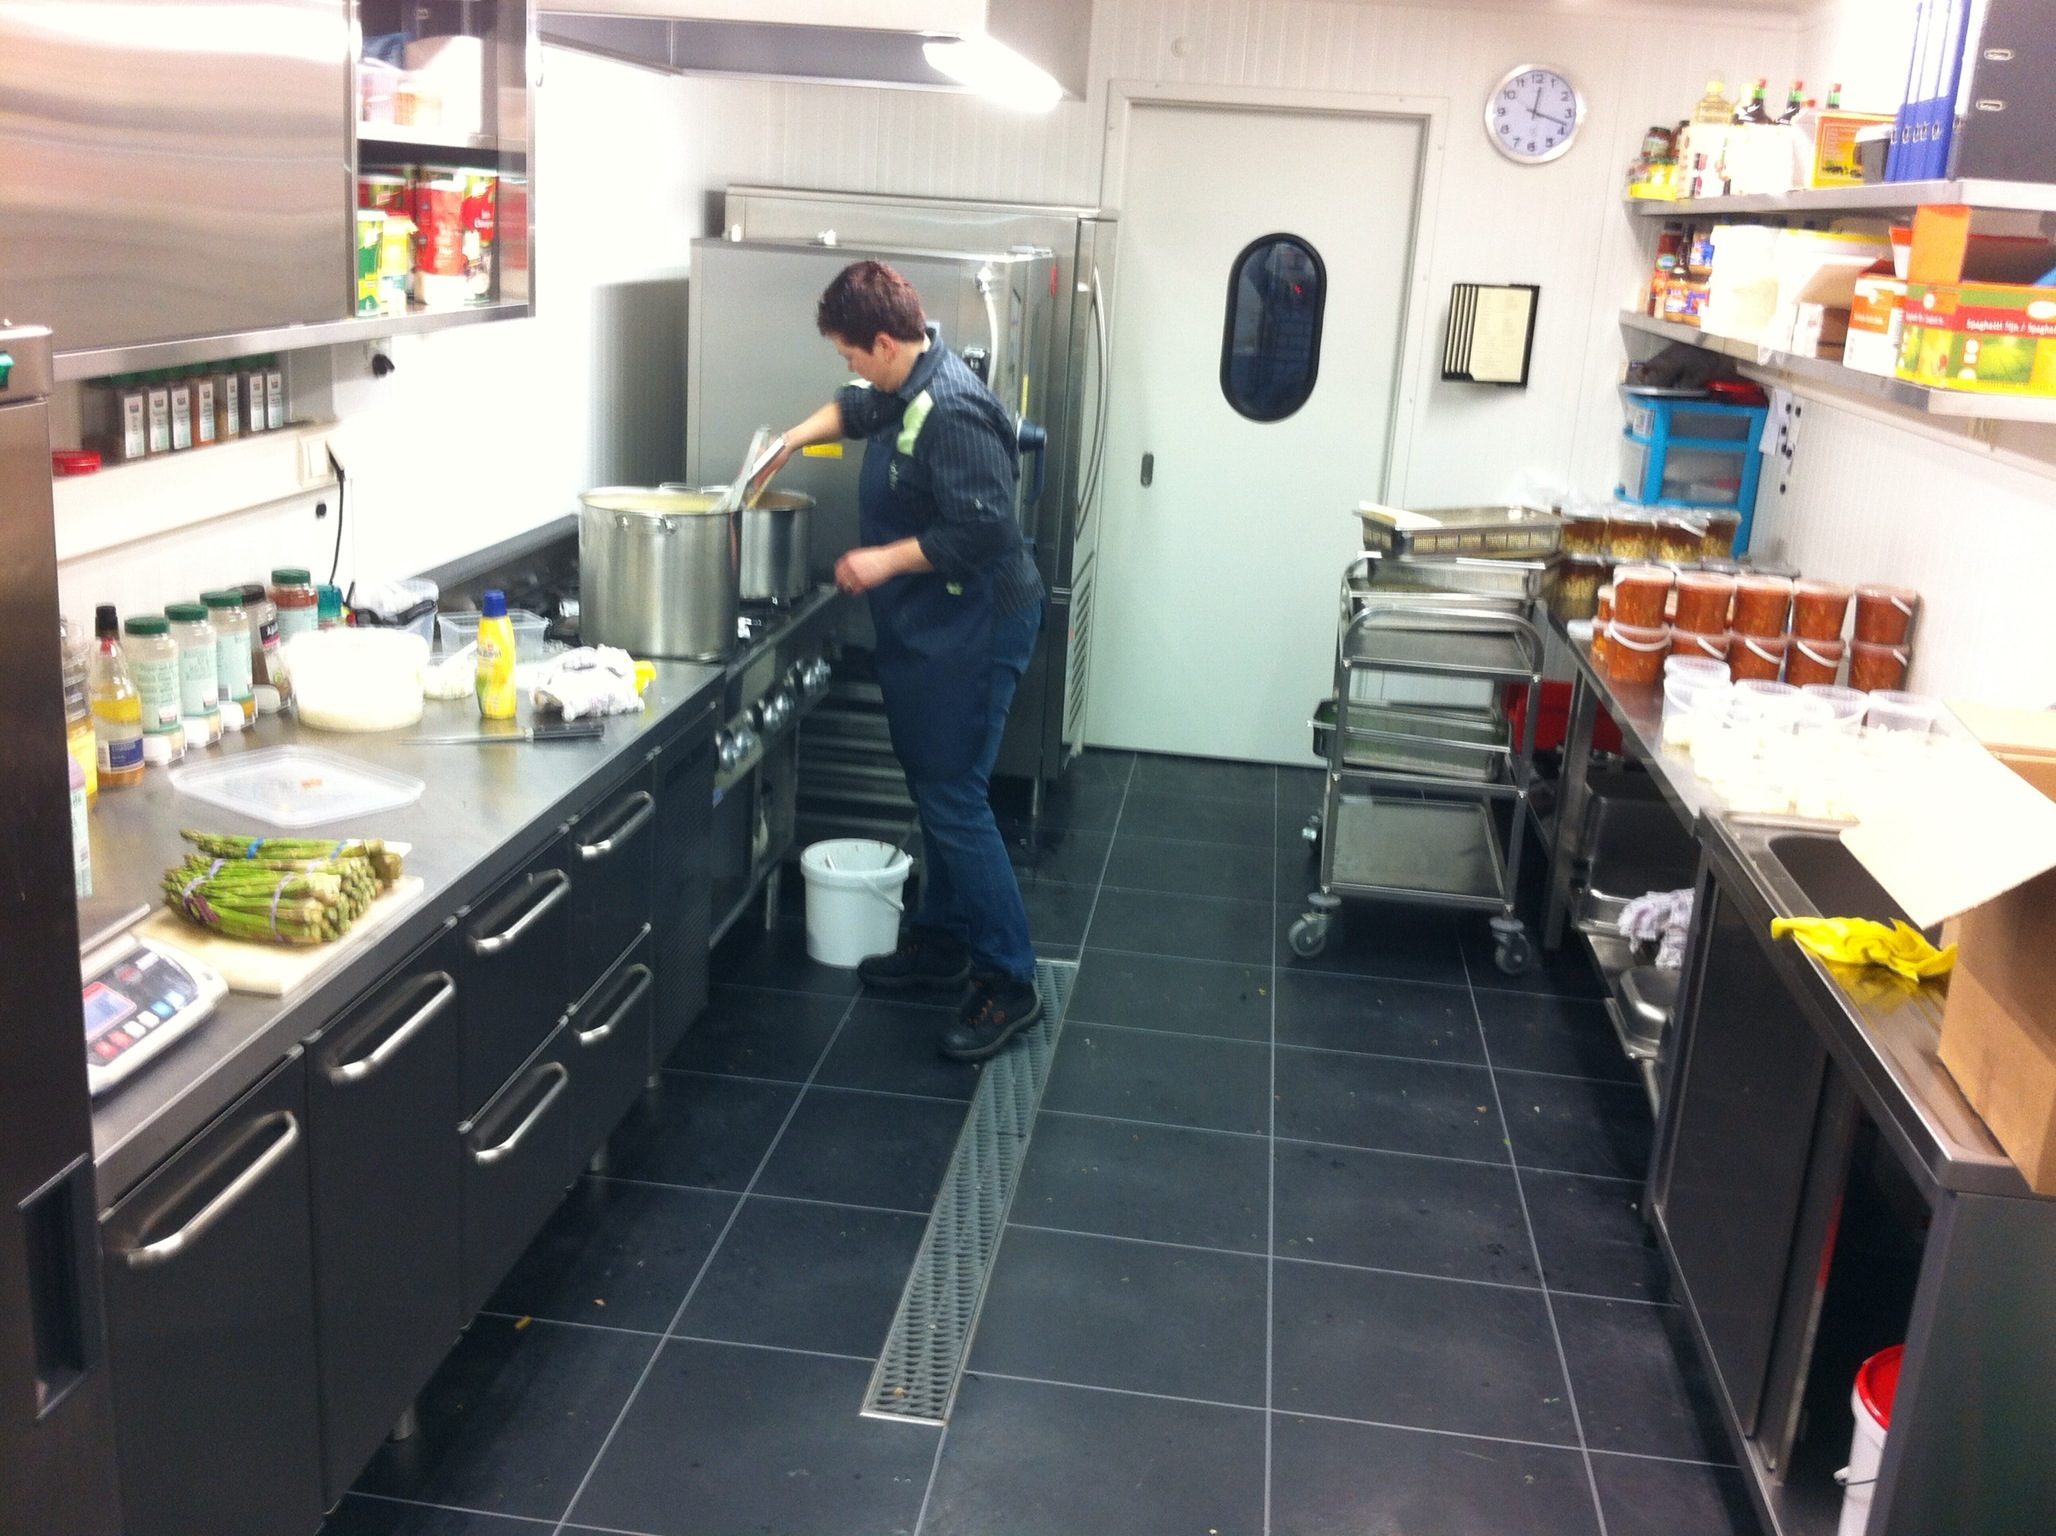 Vloeren keuken garage: top kwaliteit keuken antislip vloeren